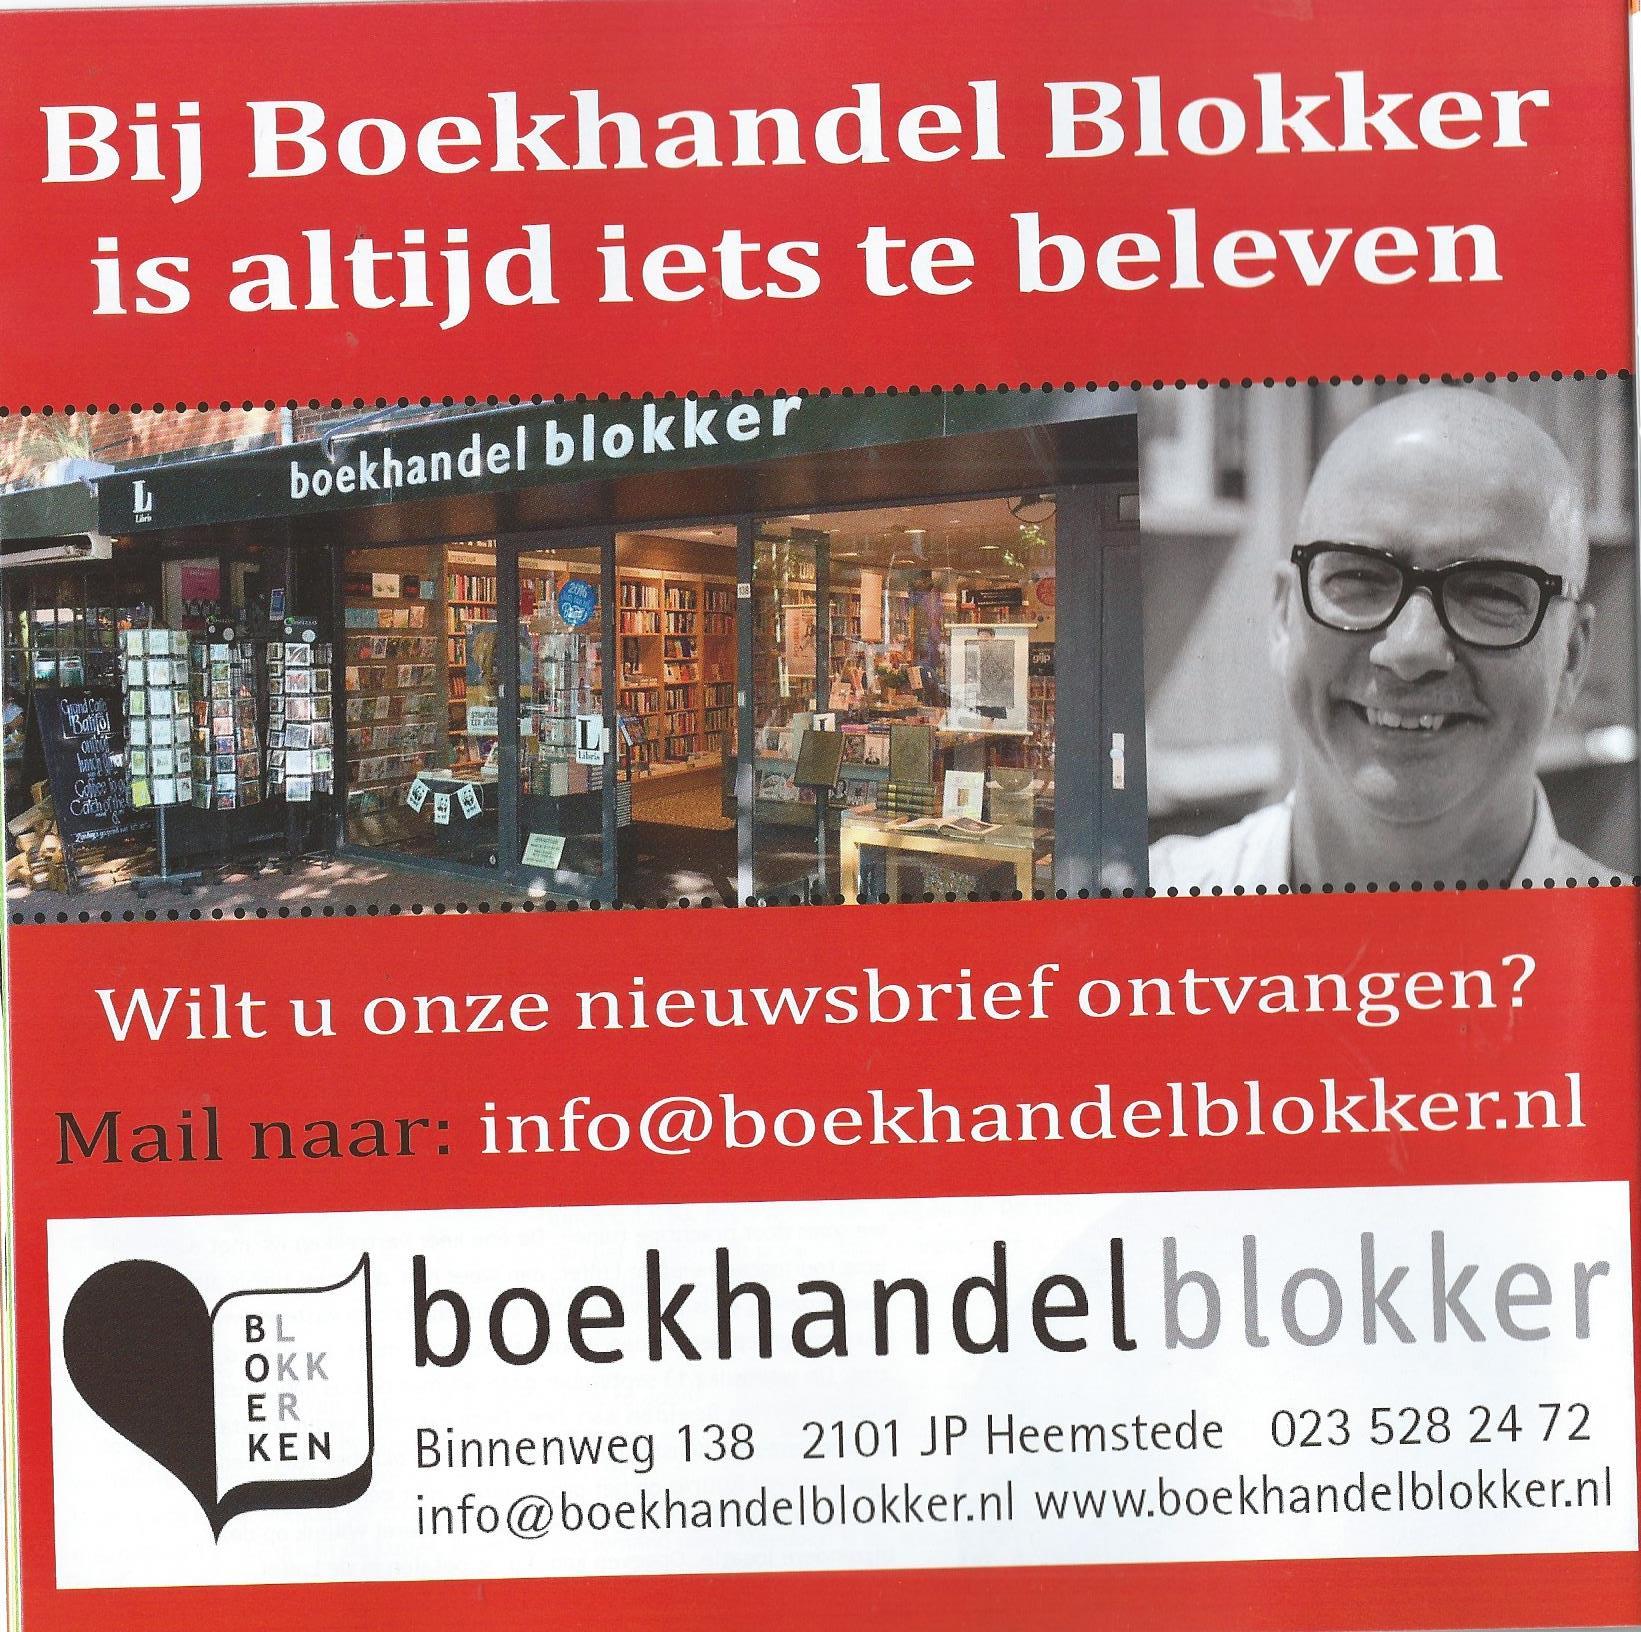 boekhandel blokker heemstede